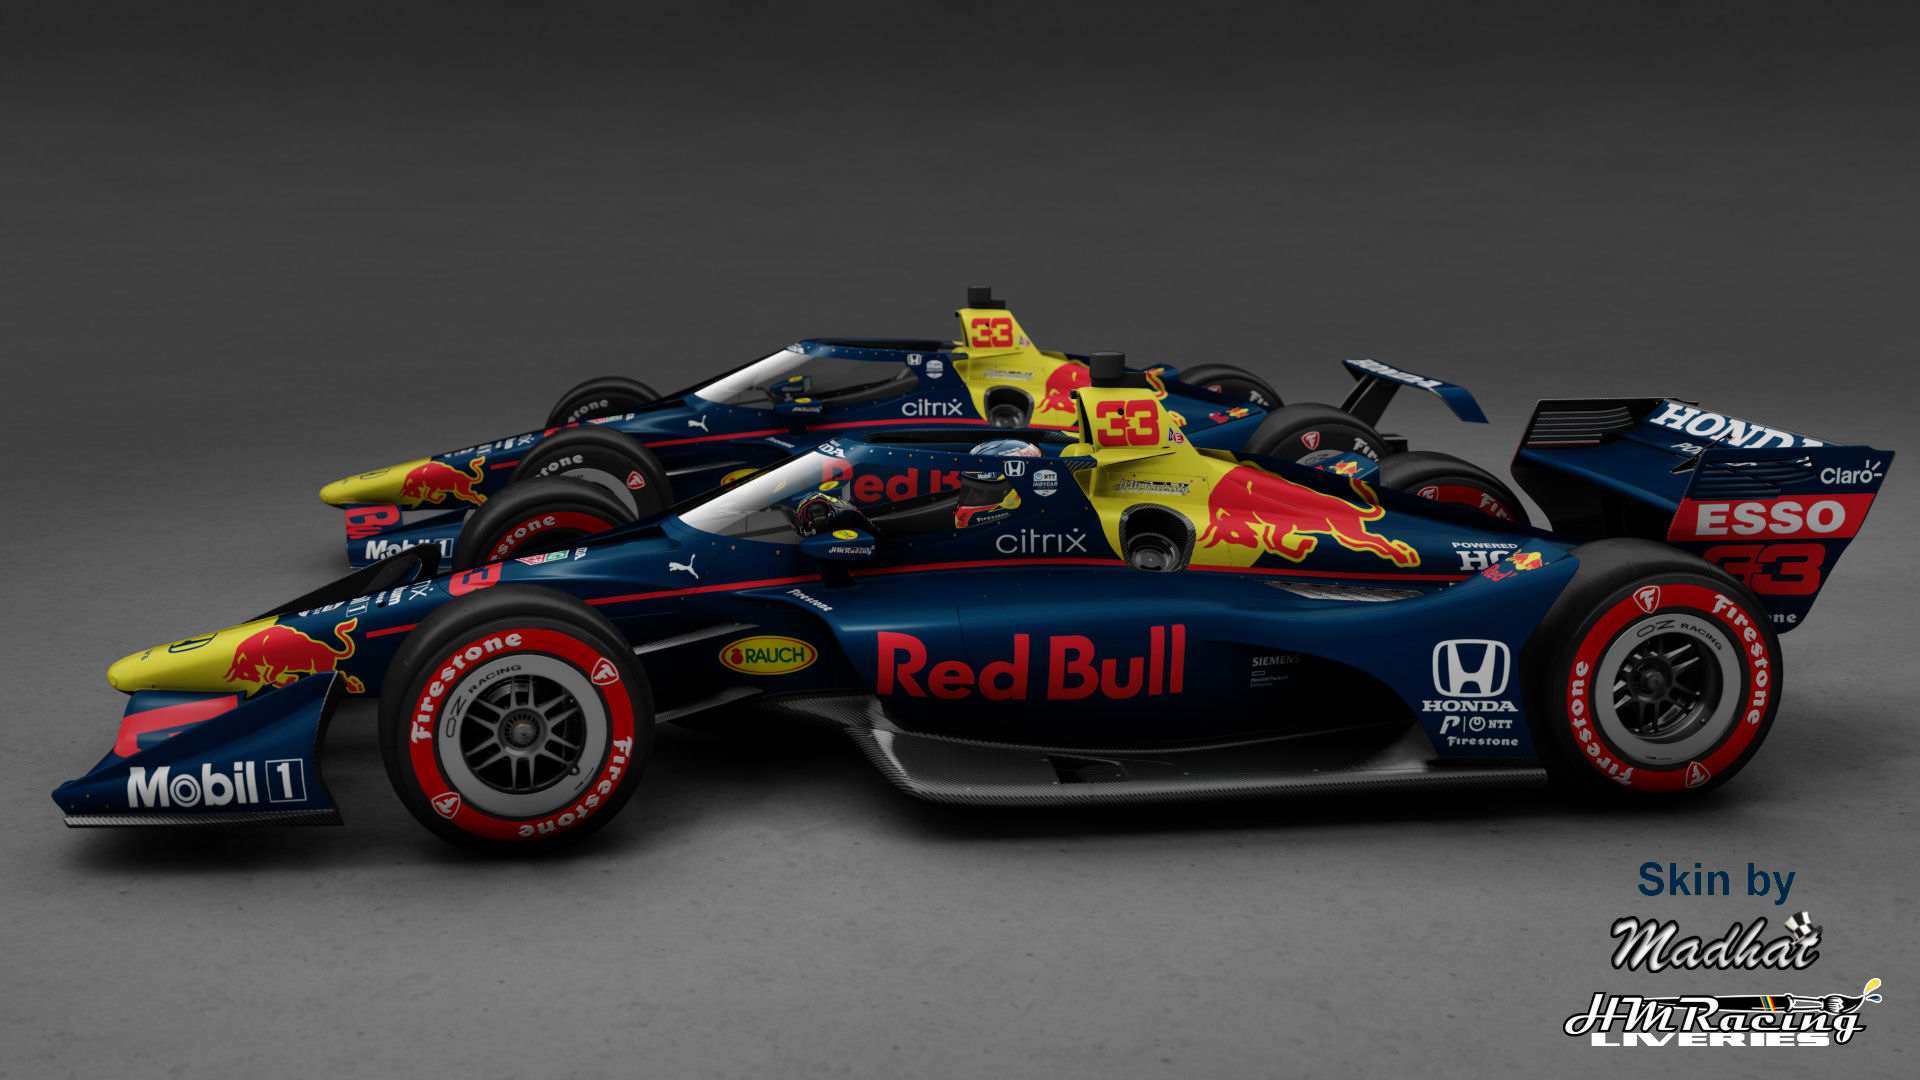 RED BULL 33 Matte IndyCar Madhat HMRacing Liveries 02.jpg